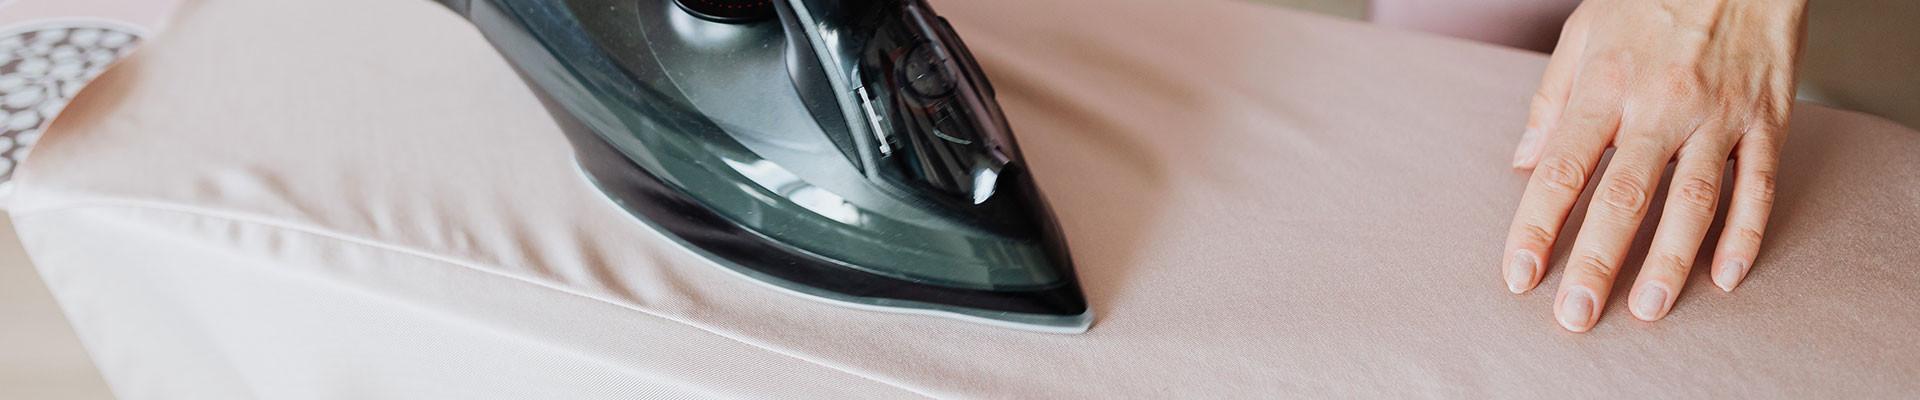 Housse table à repasser   Livraison Offerte   Hailo France